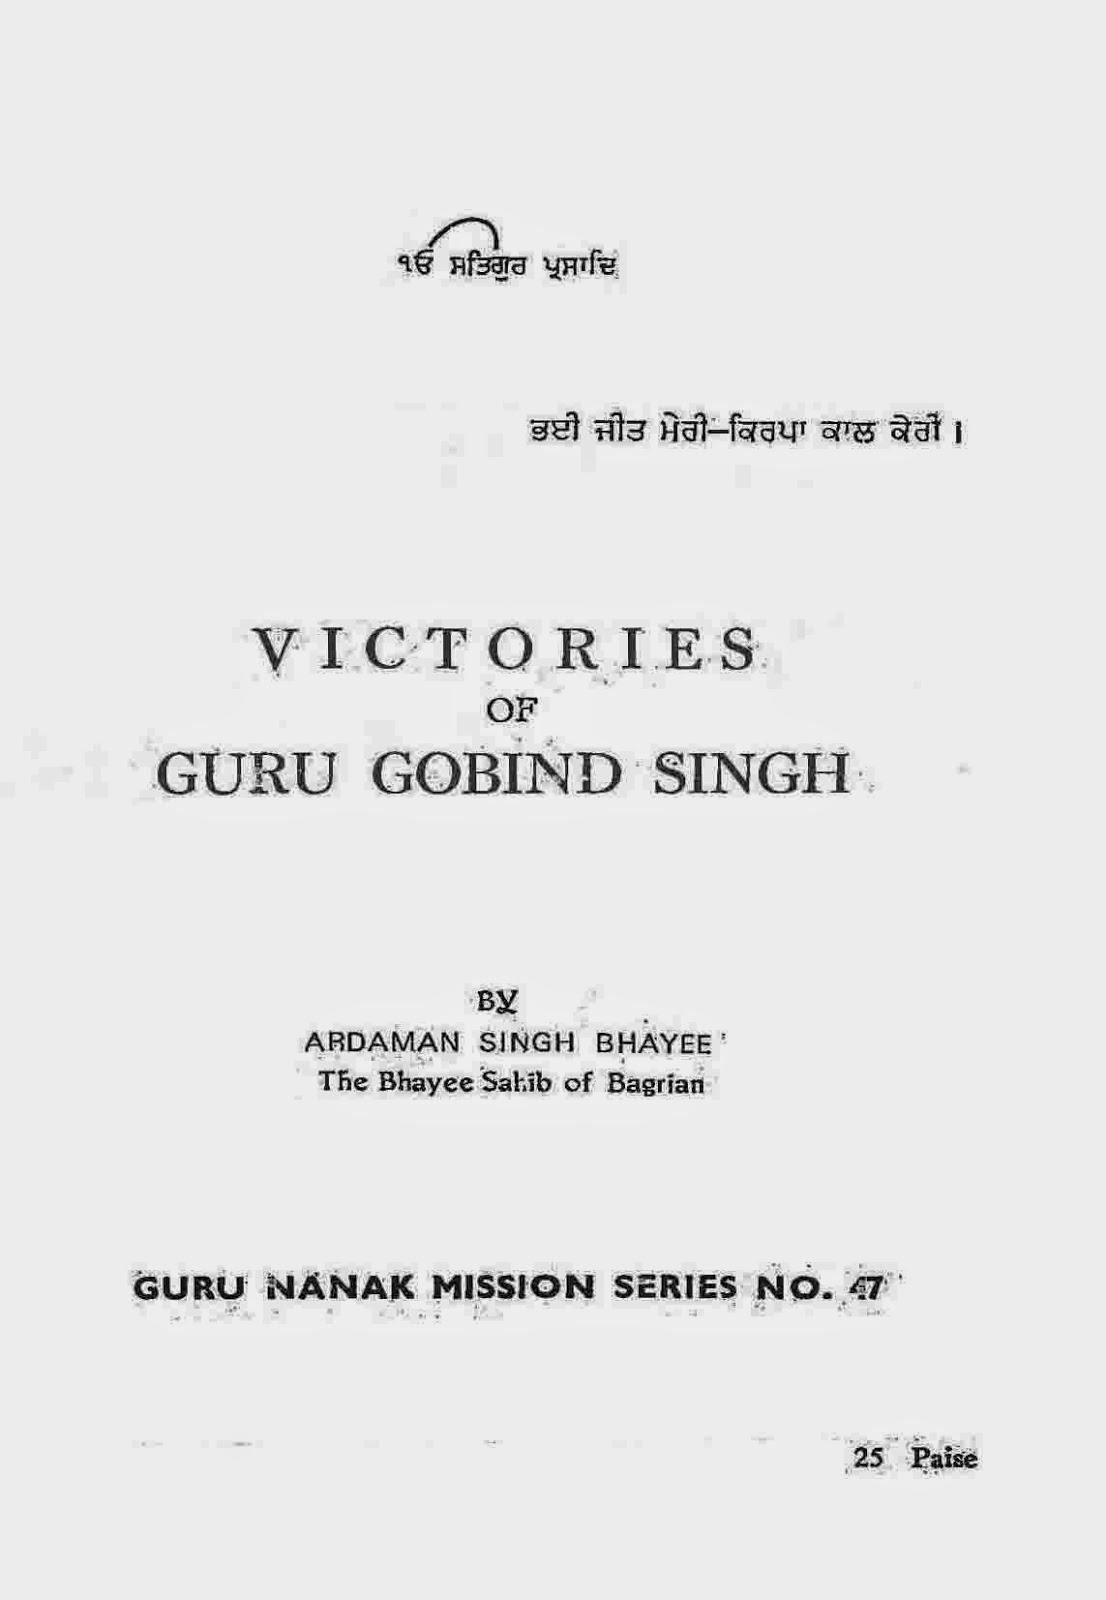 http://sikhdigitallibrary.blogspot.com/2015/11/victories-of-guru-gobind-singh-ardaman.html